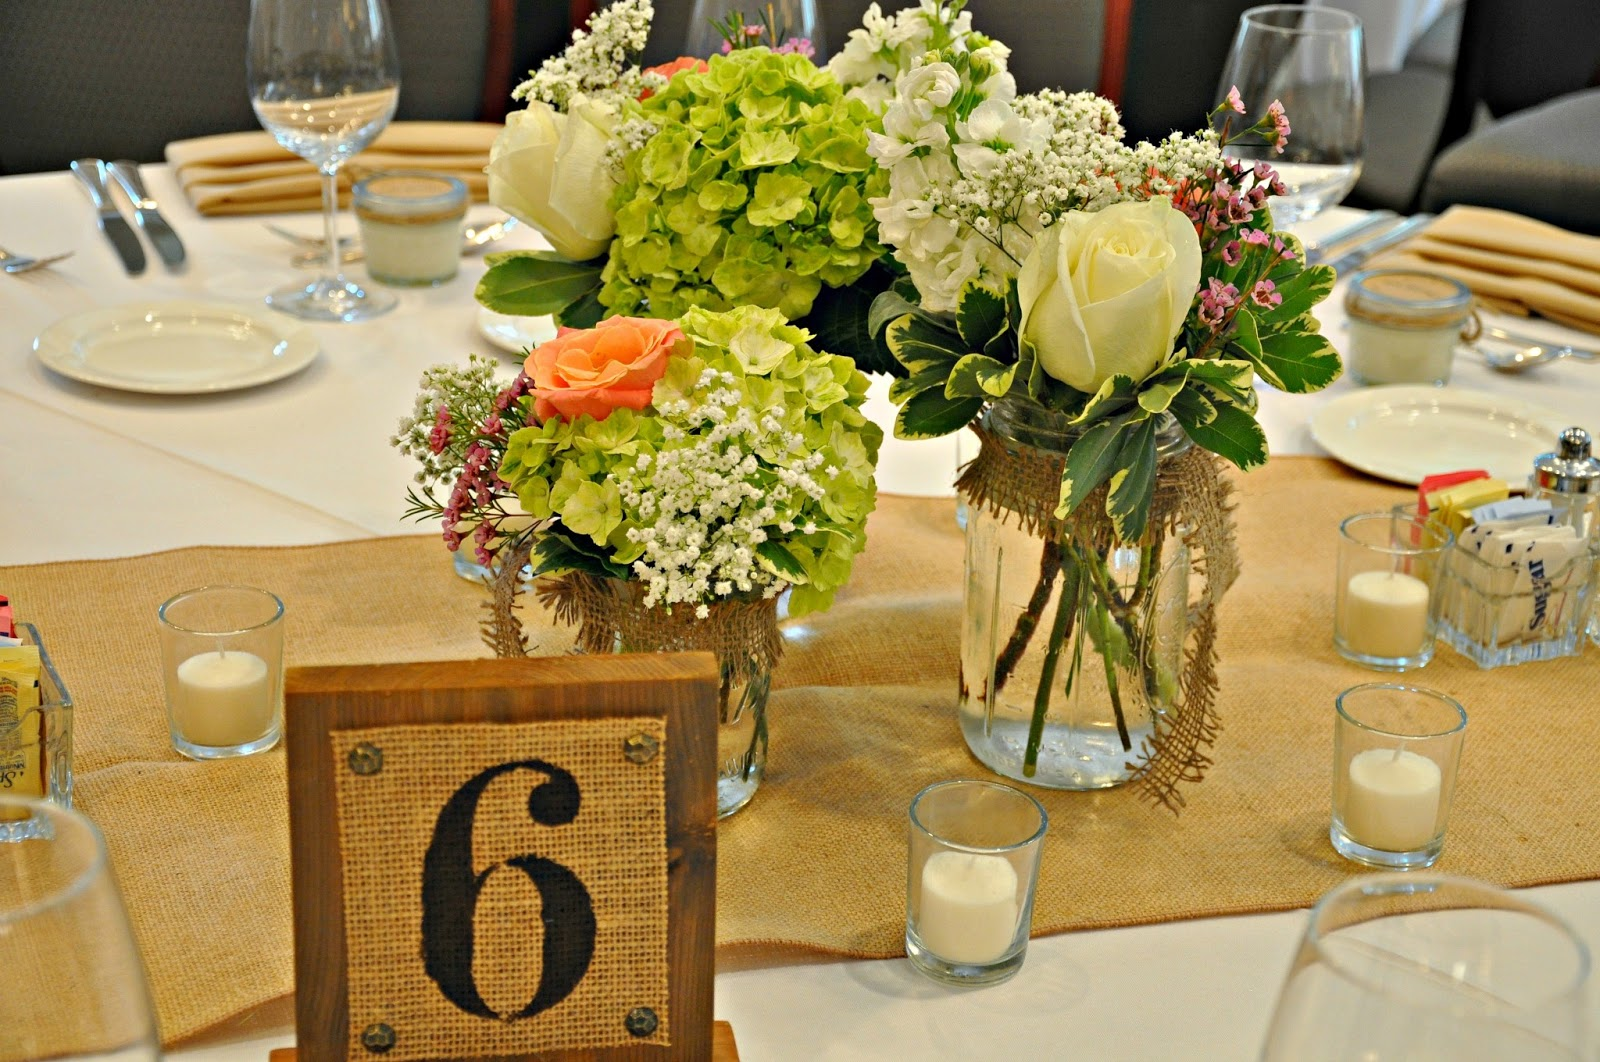 Mason jar crafts wedding -  Crafts Mason Jar Flower Arrangements Weddings Download